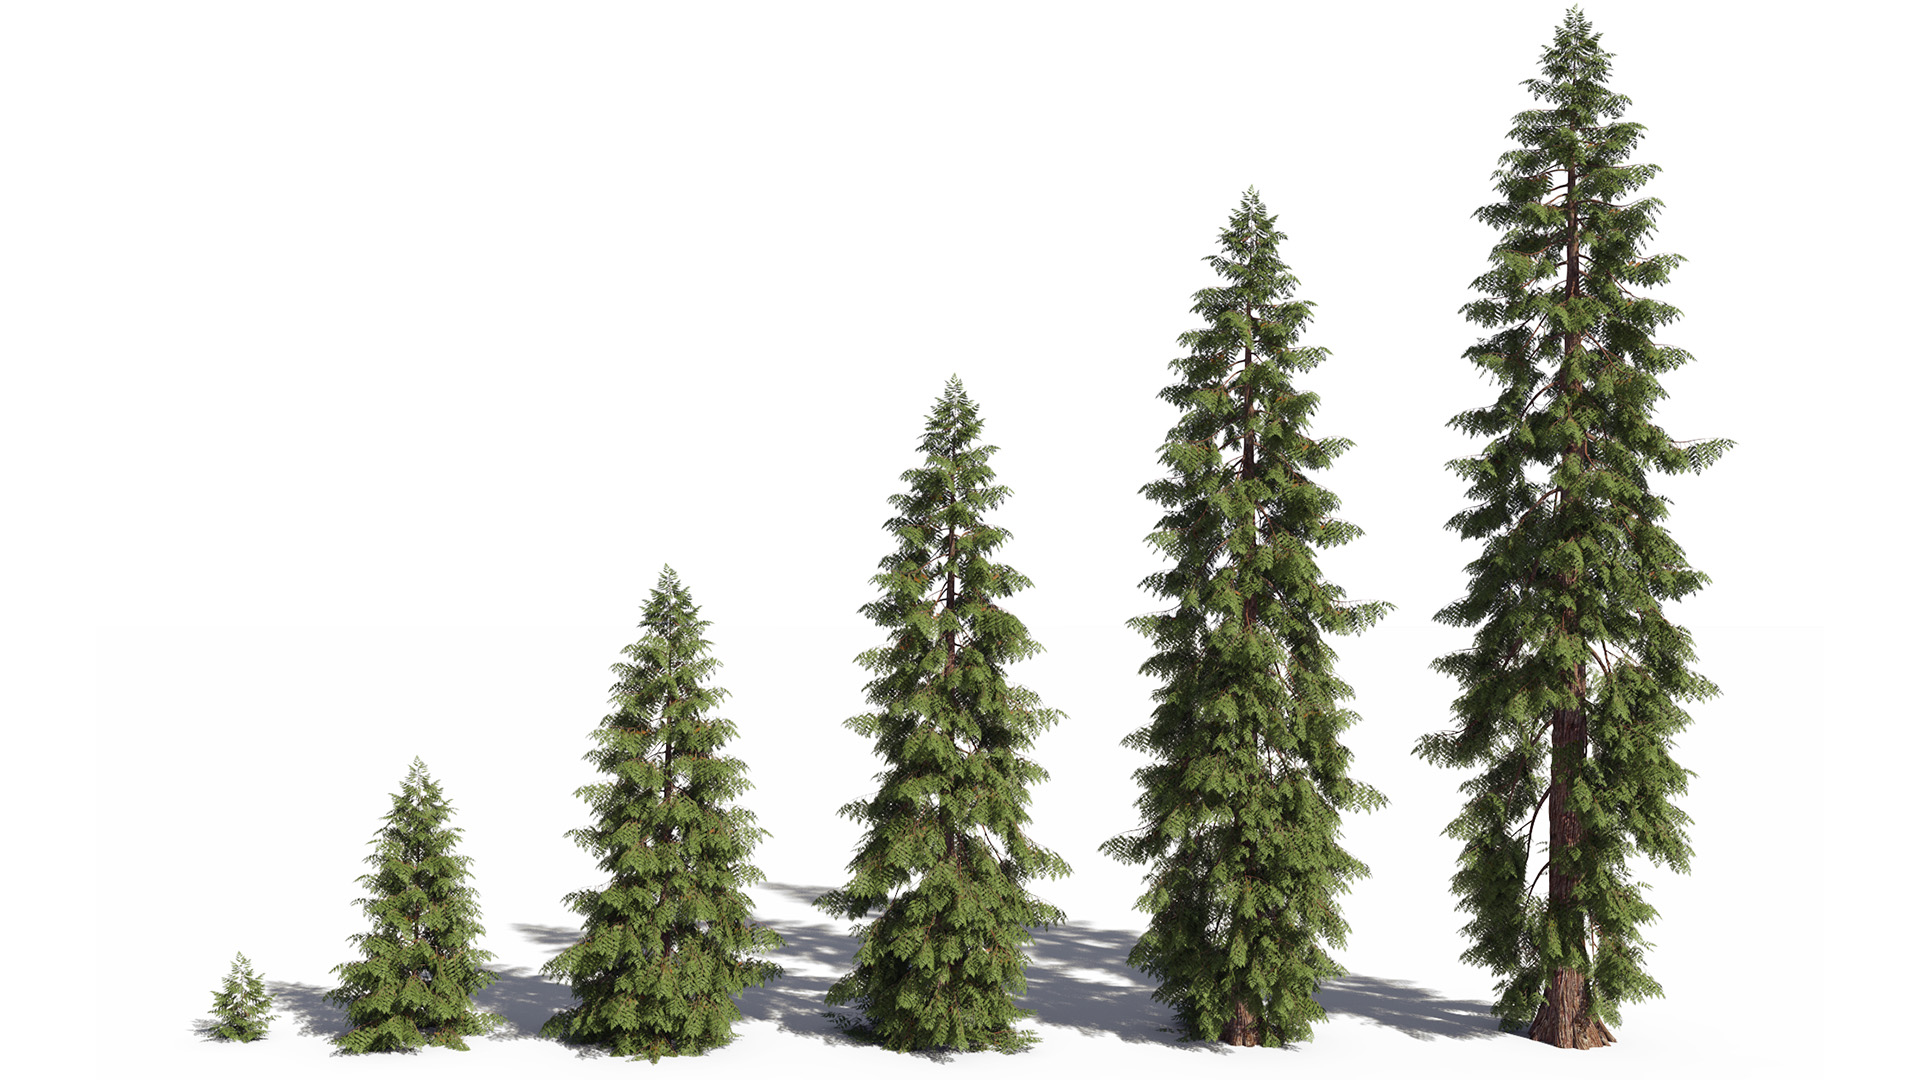 3D model of the Western red cedar Thuja plicata maturity variations